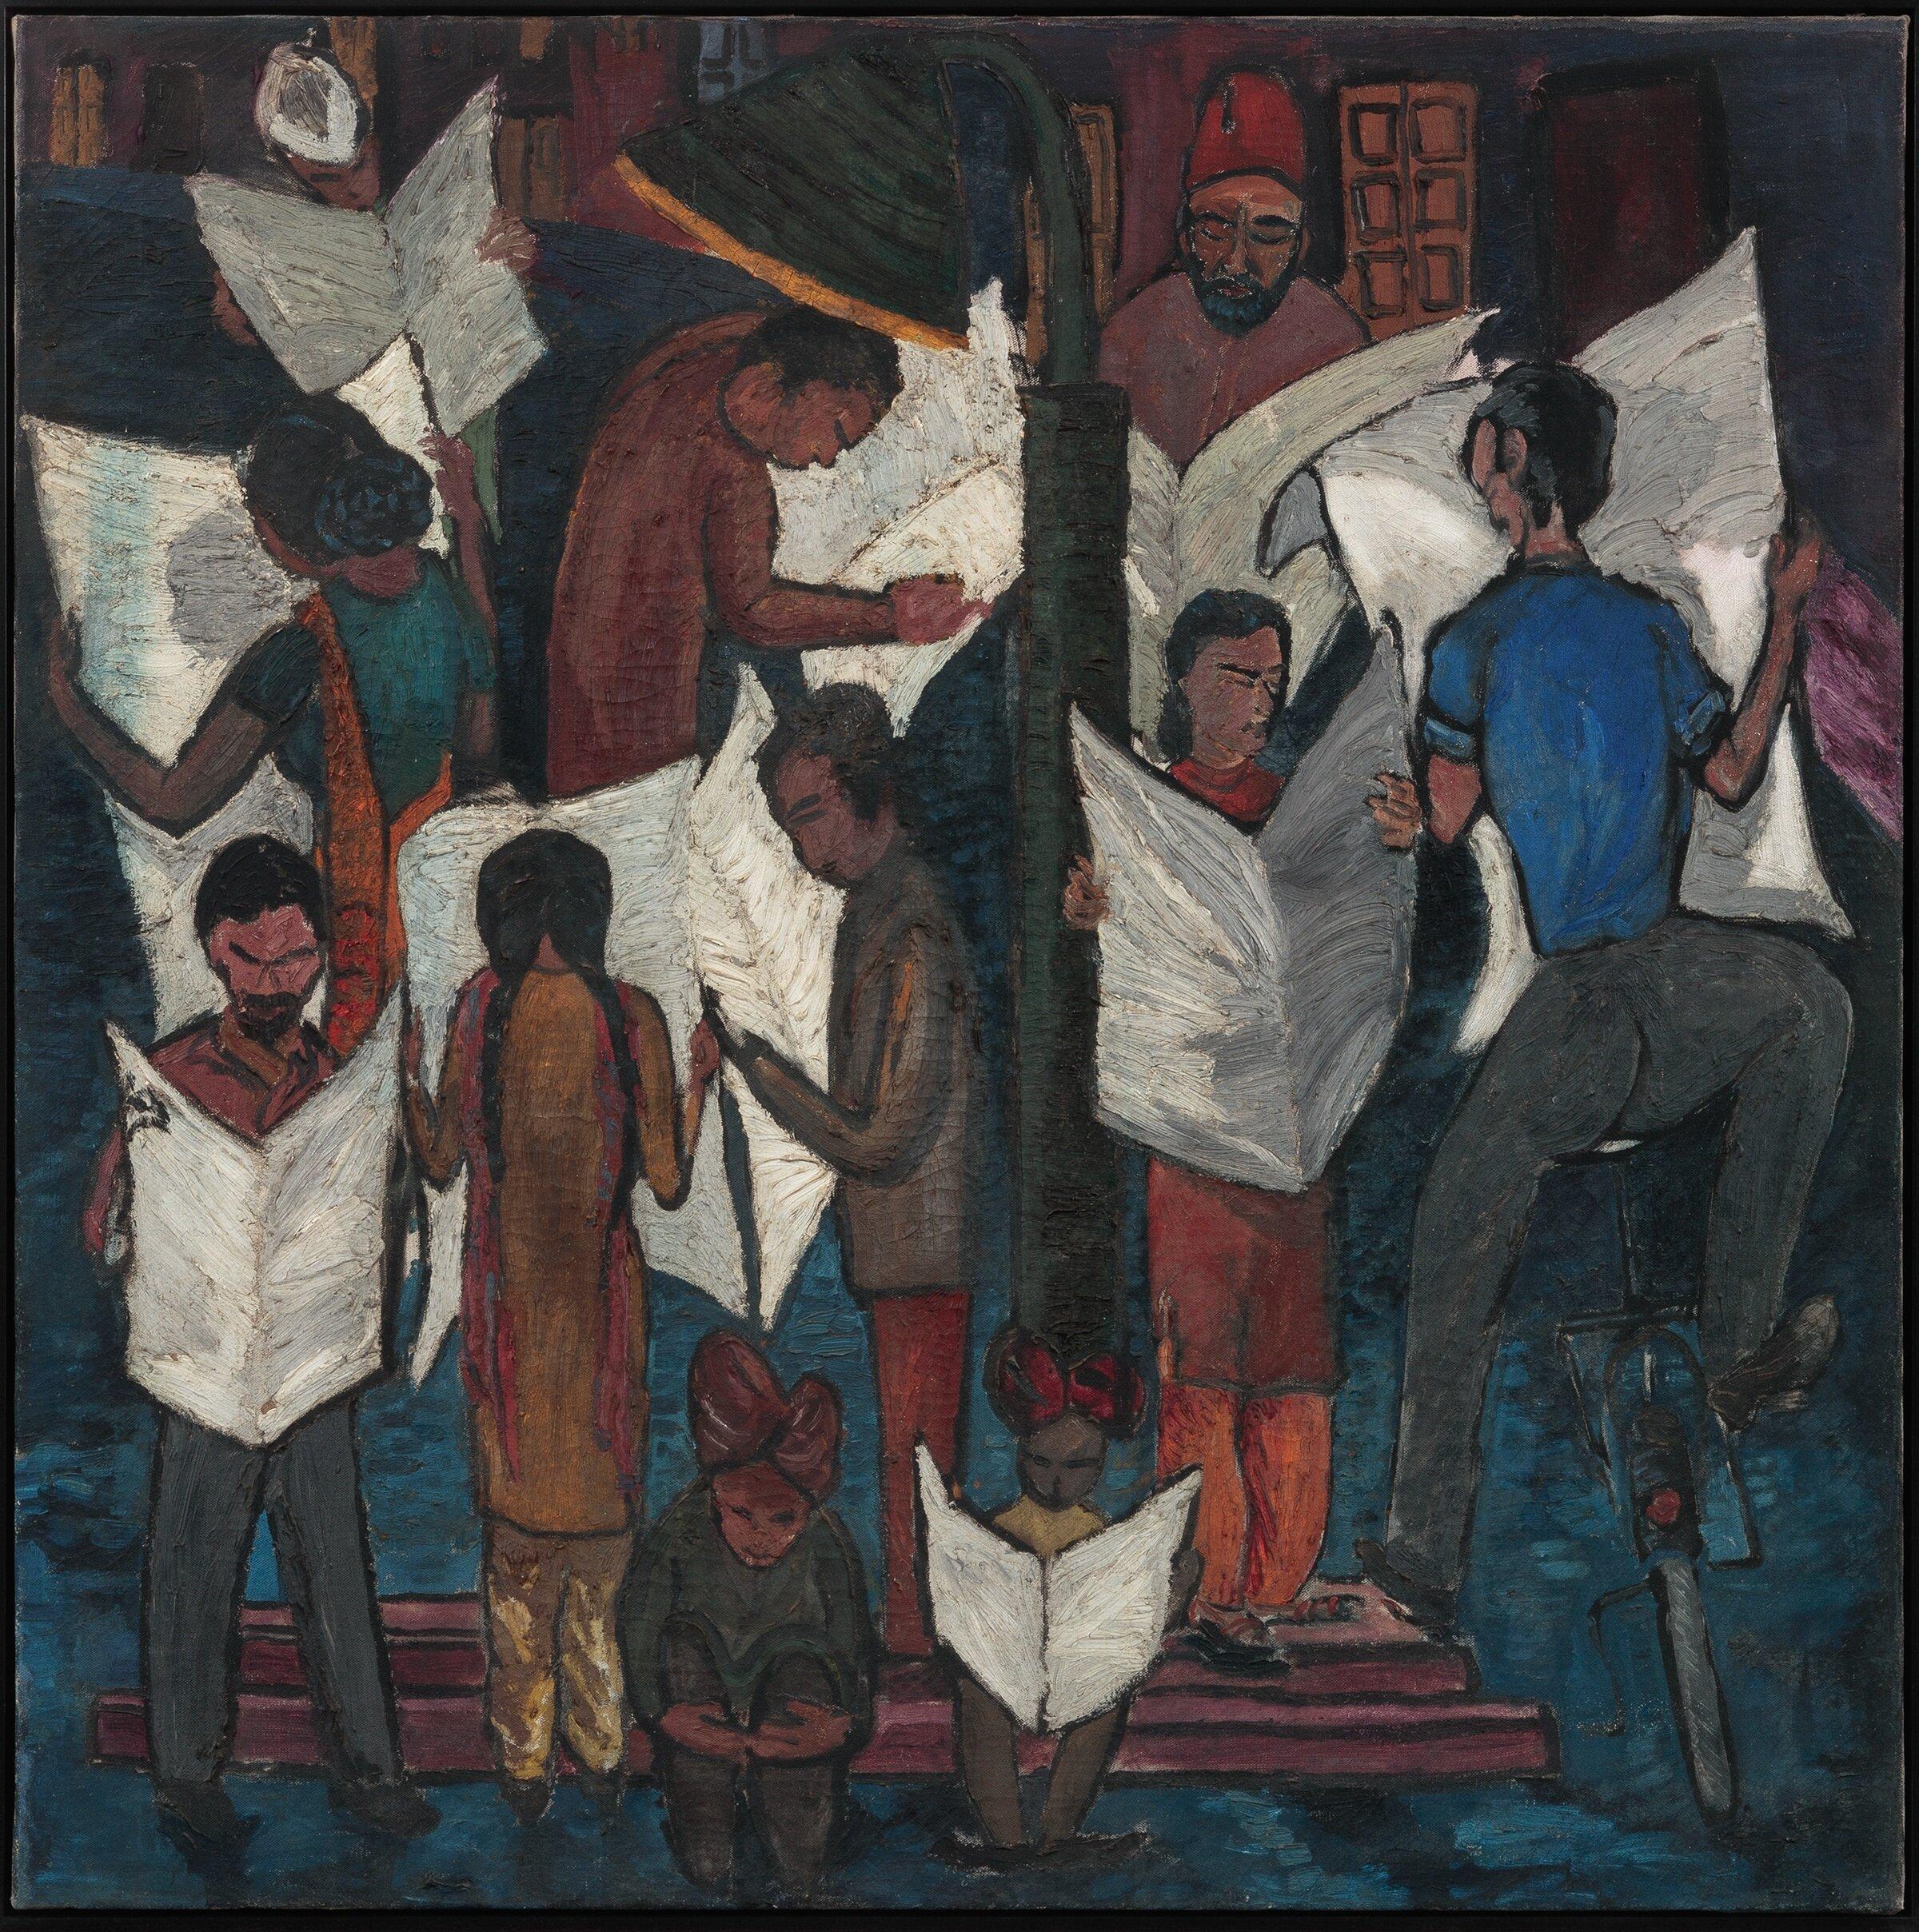 Krishen Khanna,  News of Gandhiji's Death , 1948, Oil on canvas H. 33 1/2 x W. 33 1/2 in. (85.1 x 85.1 cm), Radhika Chopra and Rajan Anandan